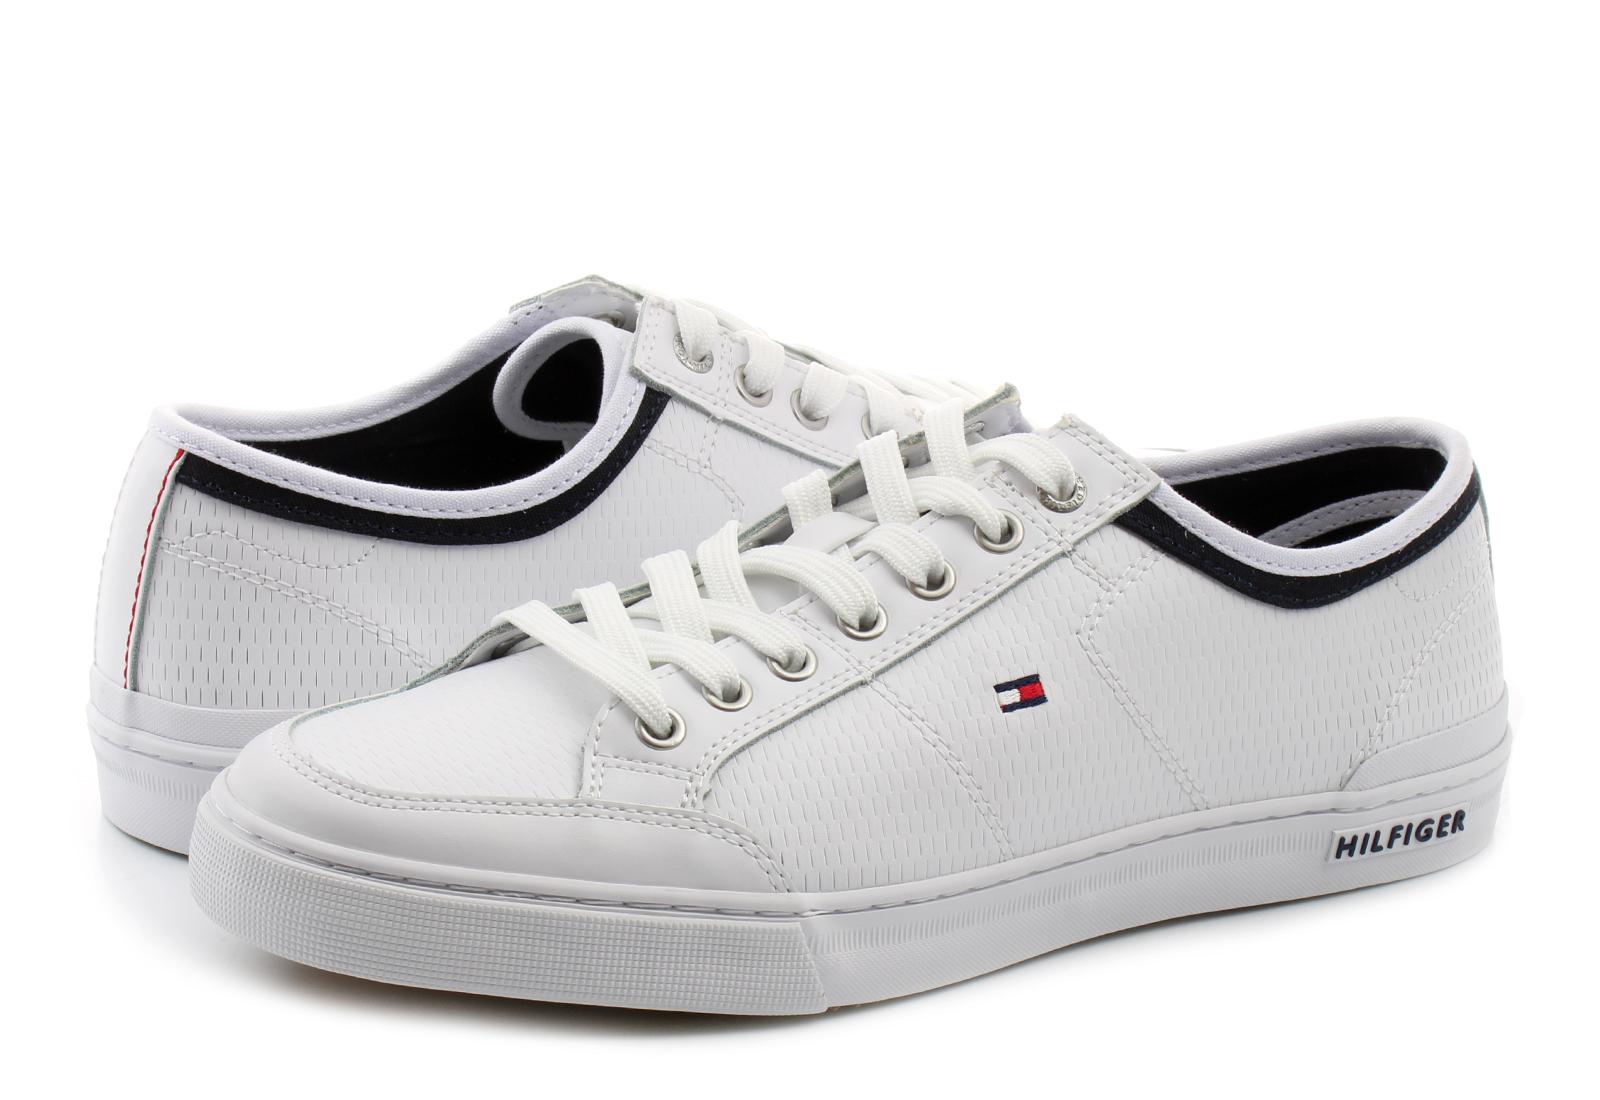 b218176750 Tommy Hilfiger Cipő - Harrington 5 - 18S-1497-100 - Office Shoes ...